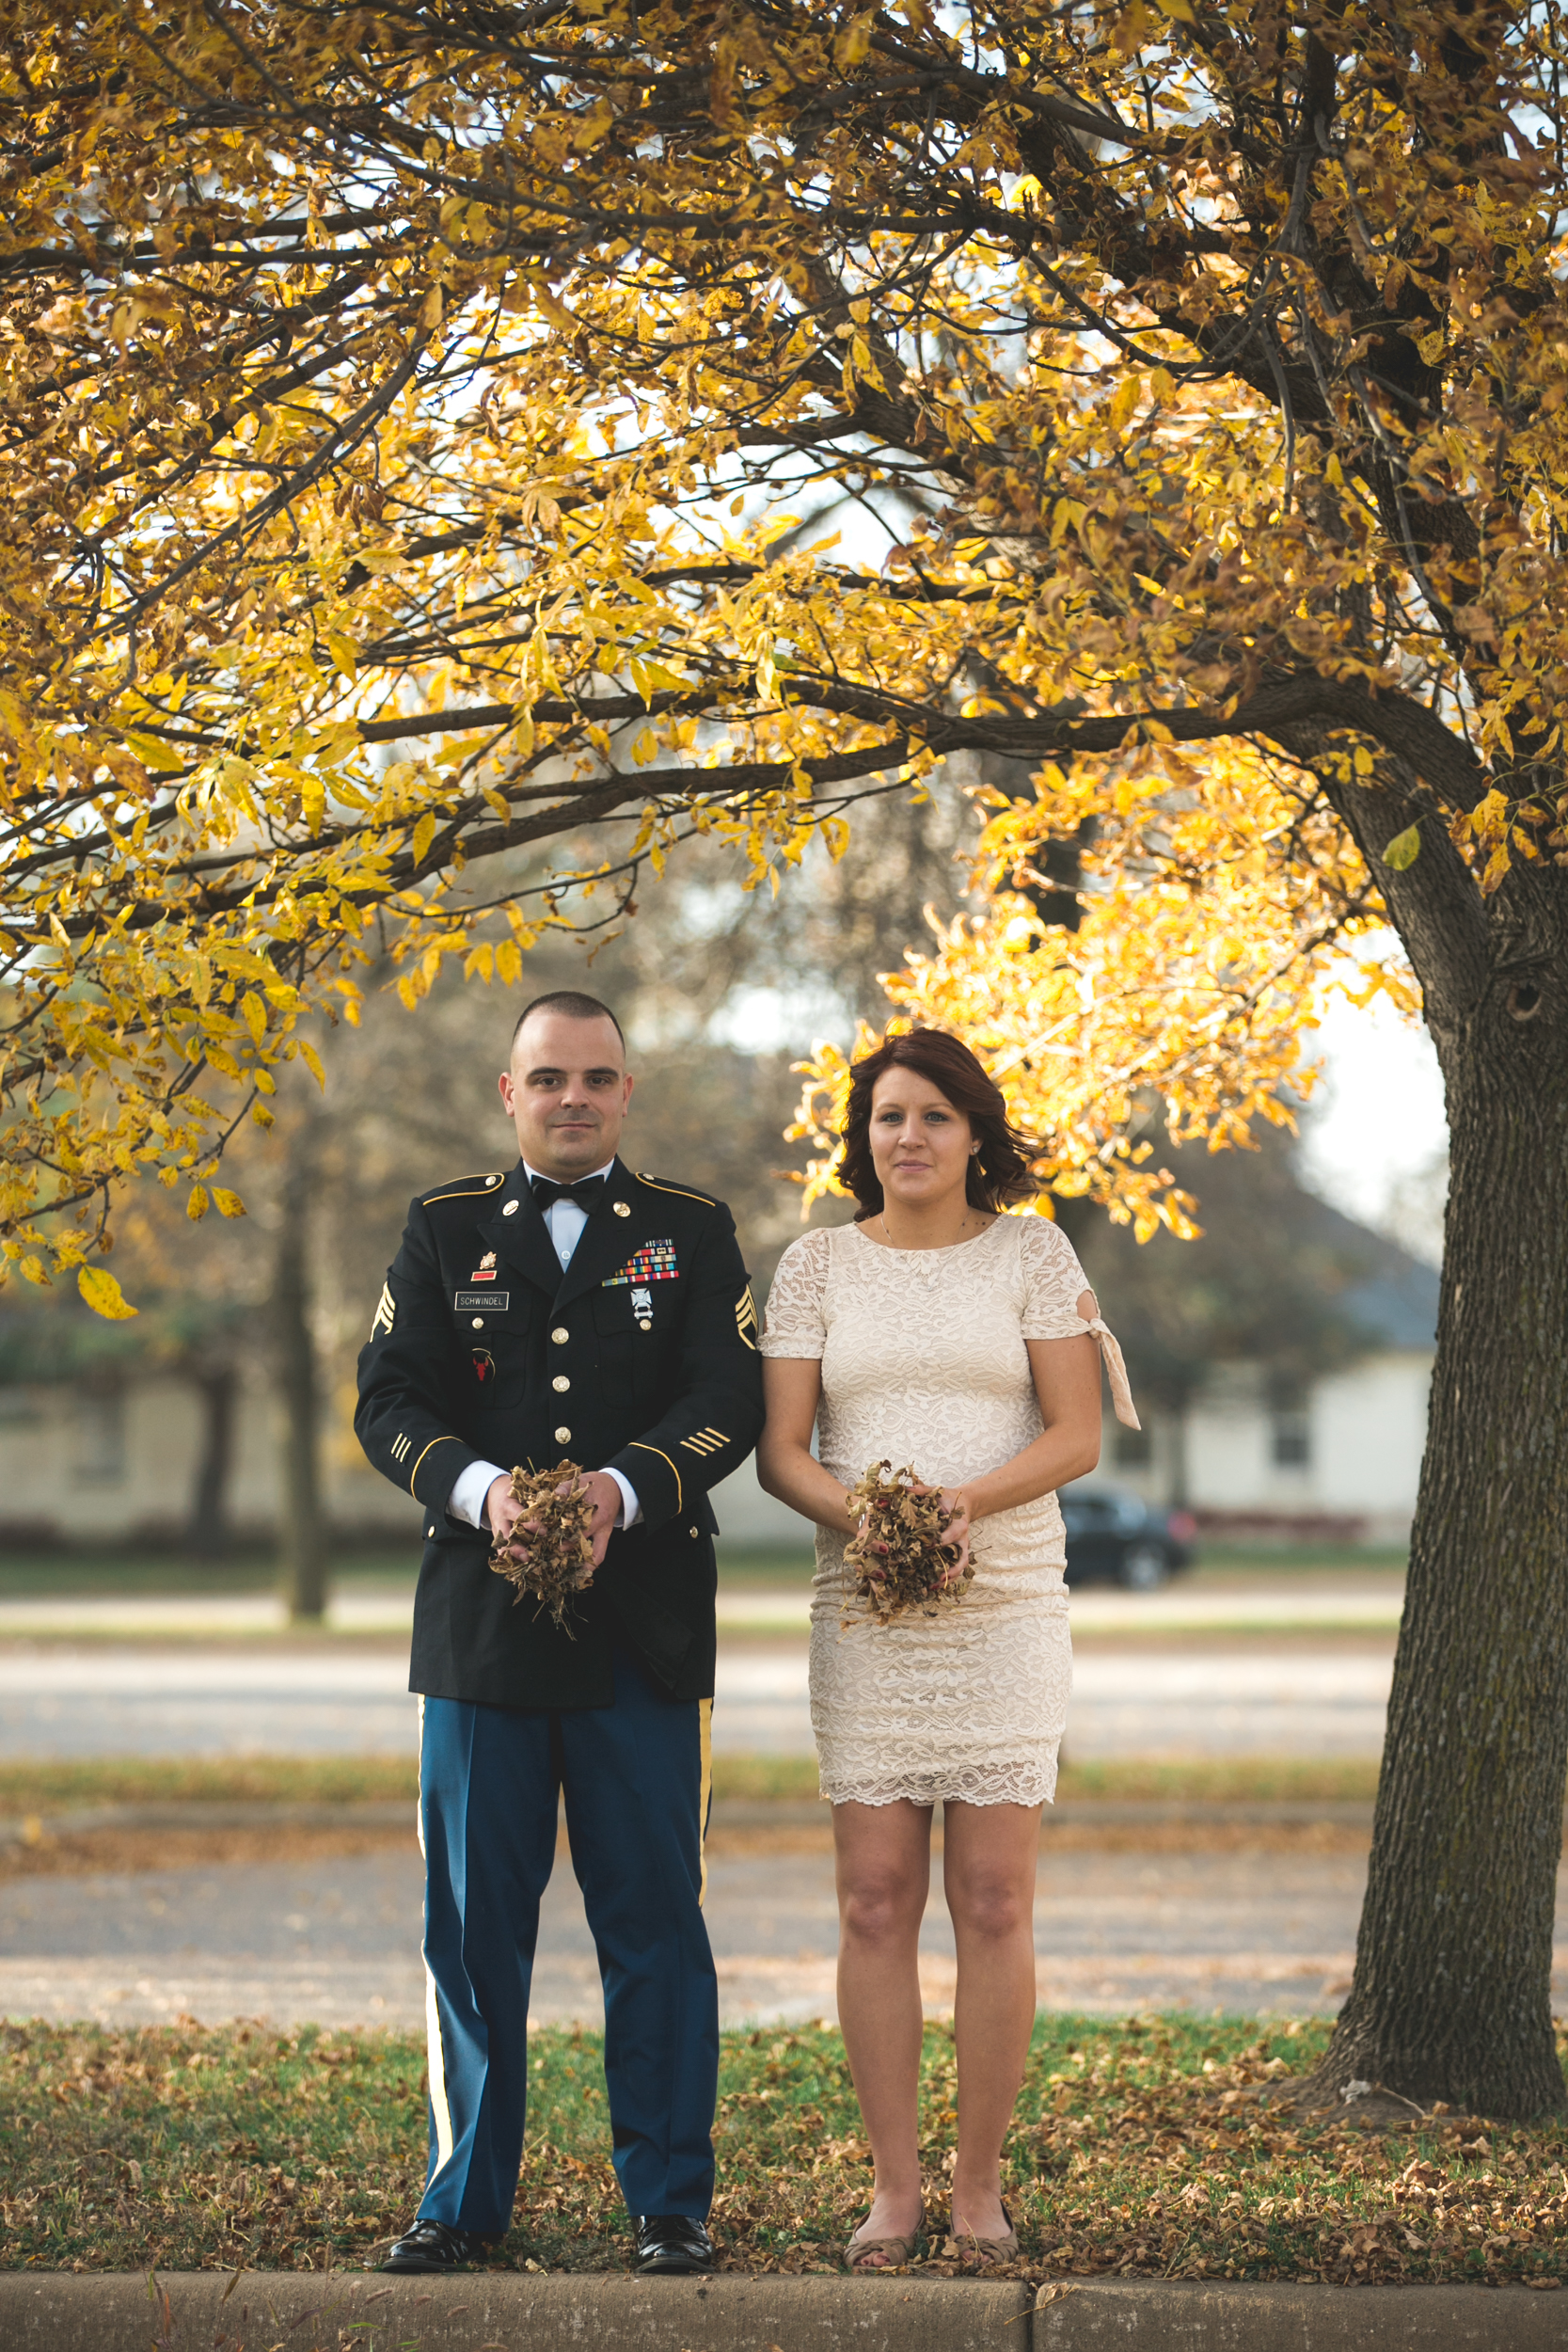 Fort Snelling Elopement St. Paul, MN, Fort Snelling Elopement, Military Elopement, Intimate Military Wedding, intimate elopement wedding-www.rachelsmak.com23.jpg